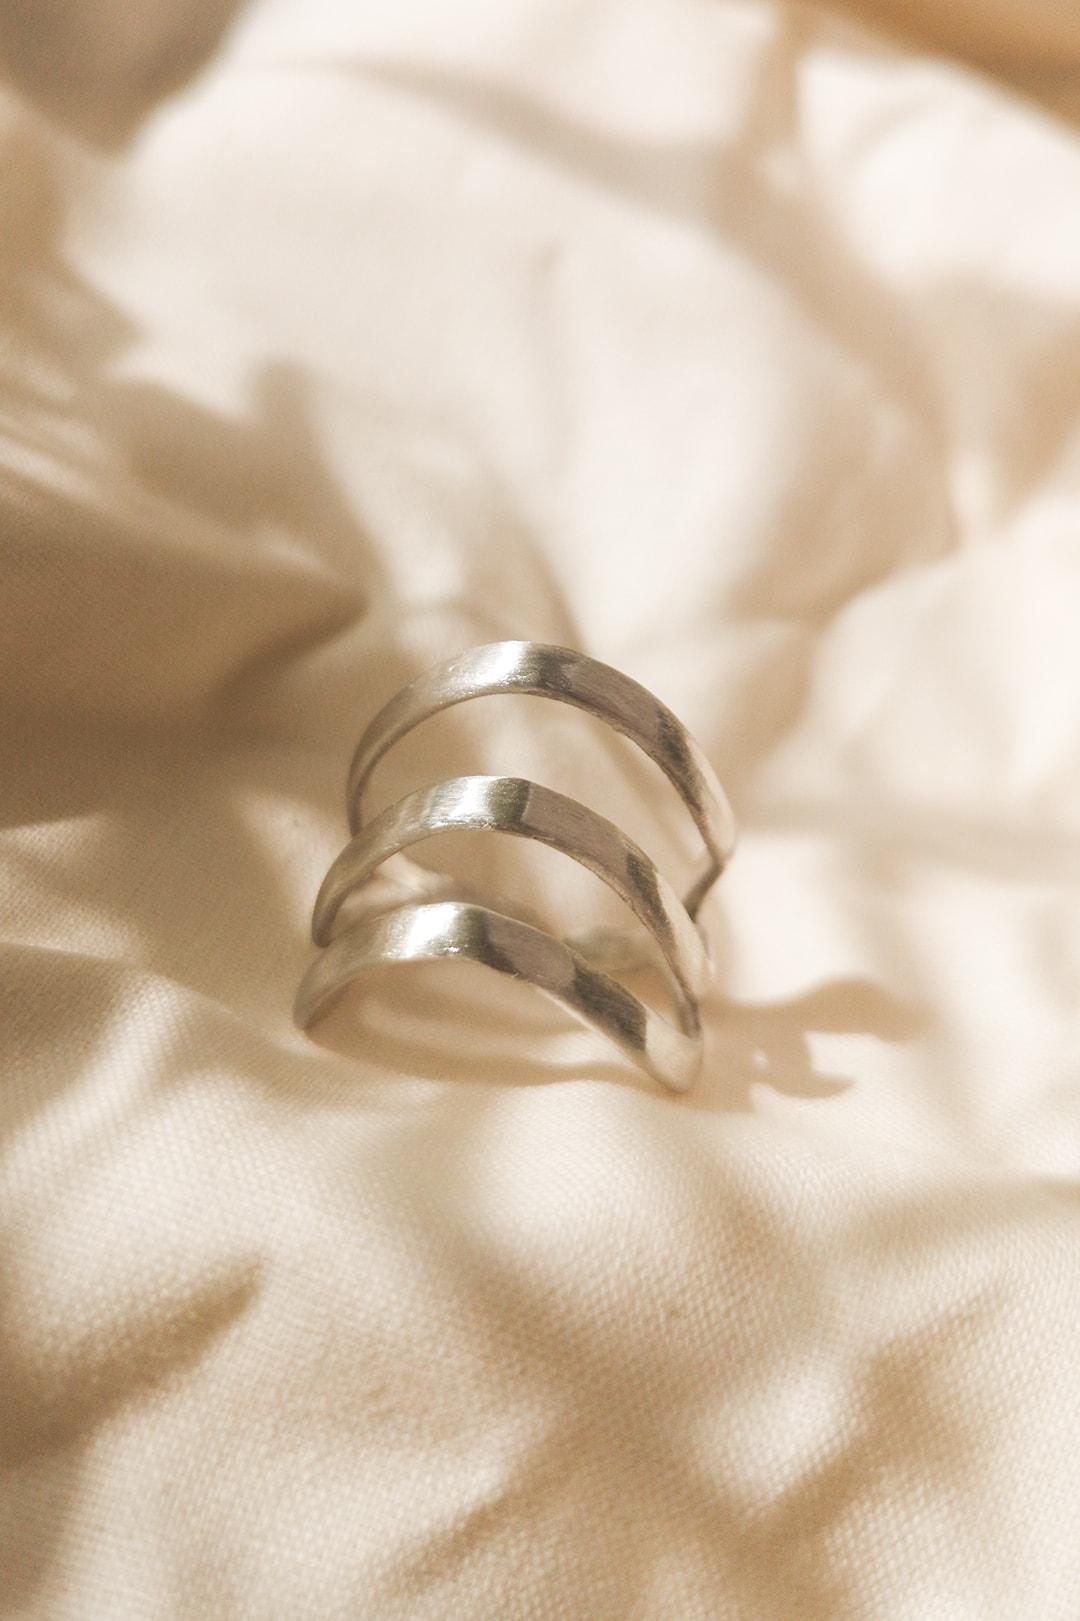 Silber Ring Design